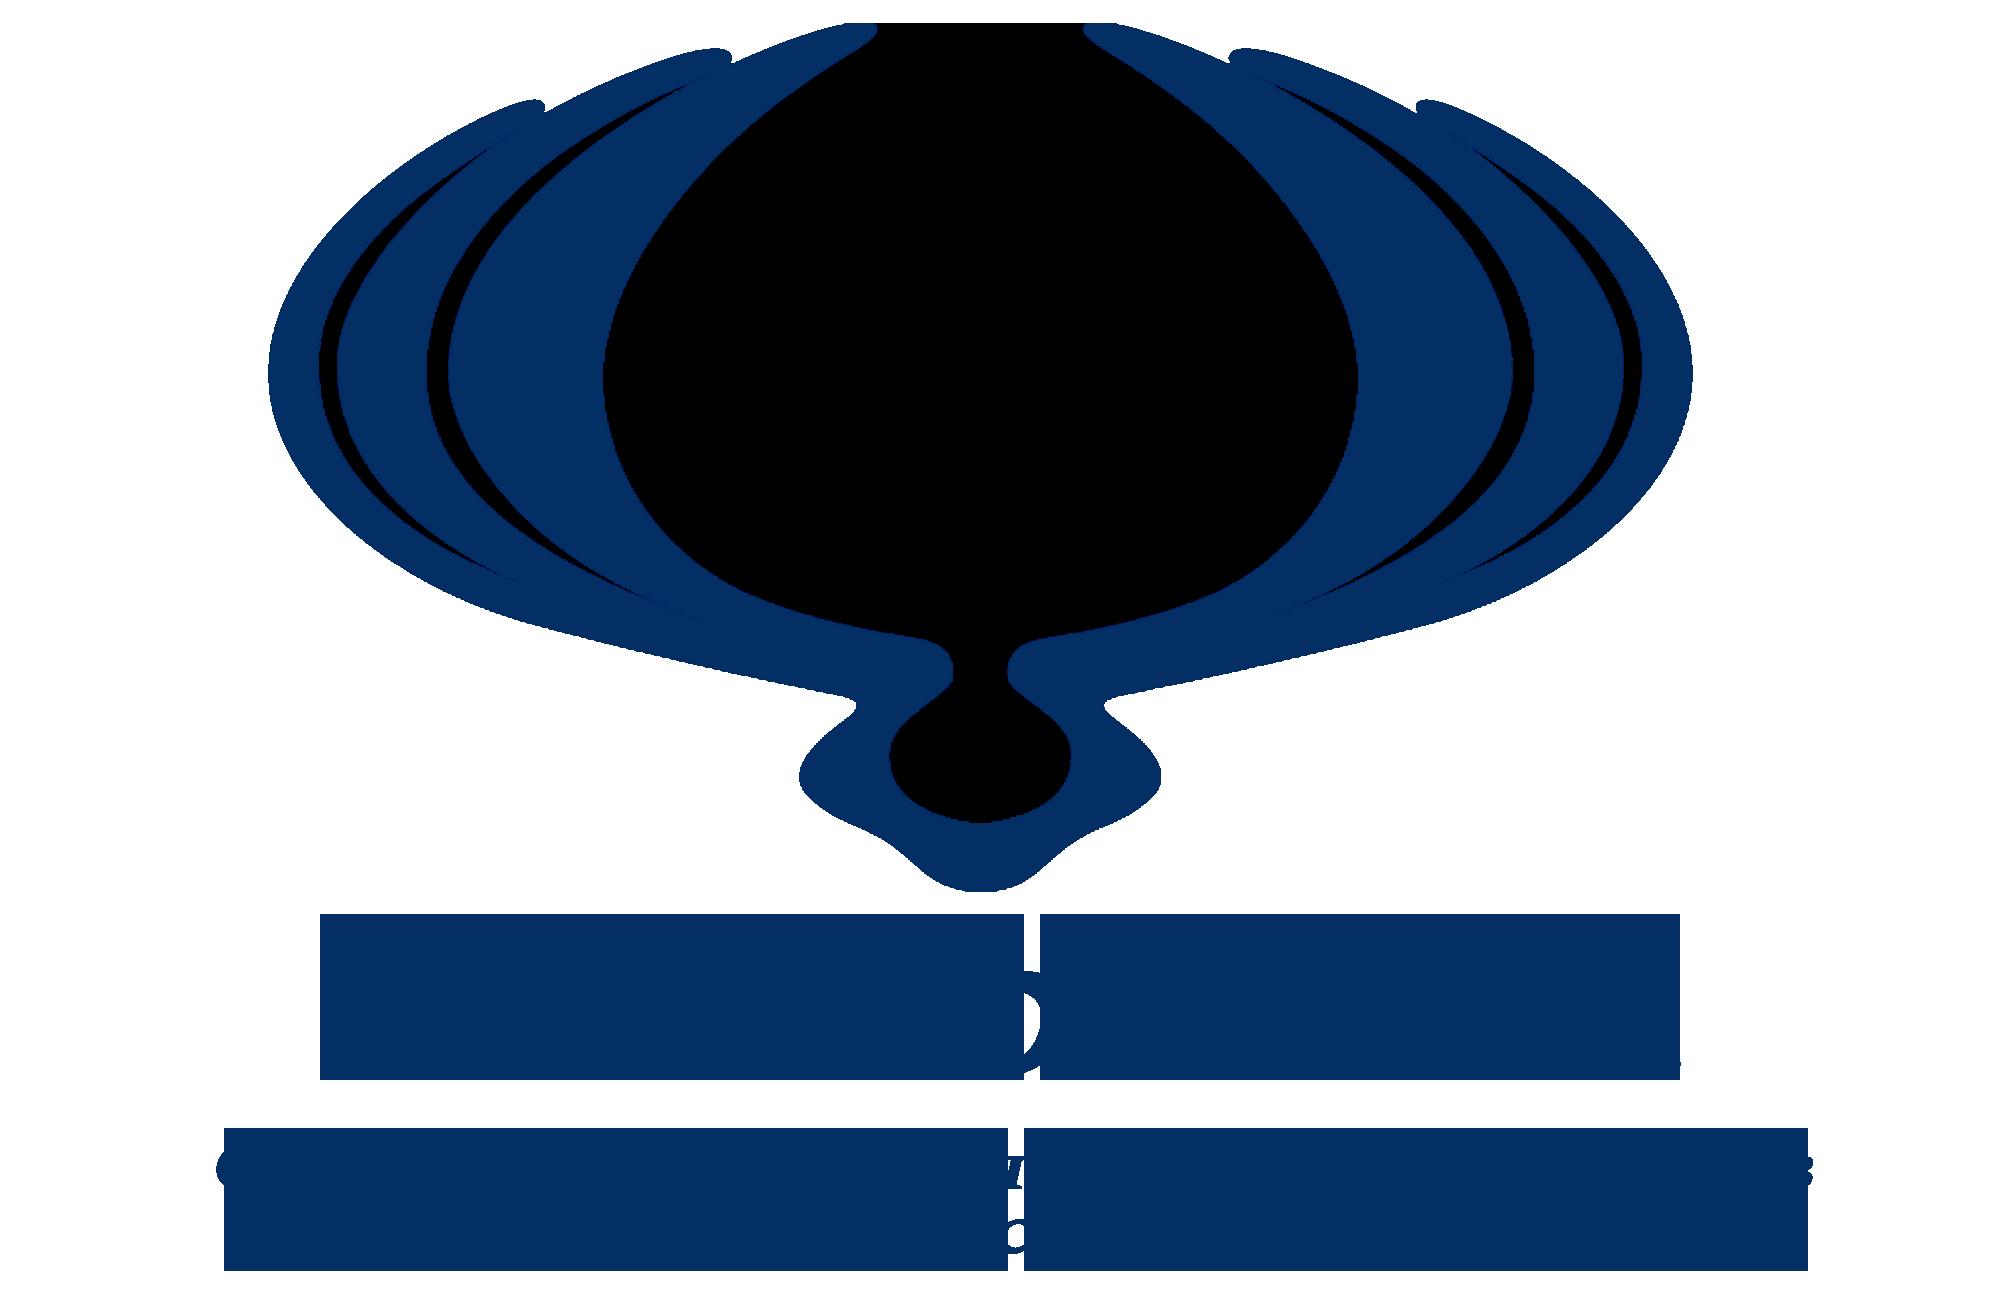 Логотип клуба.png